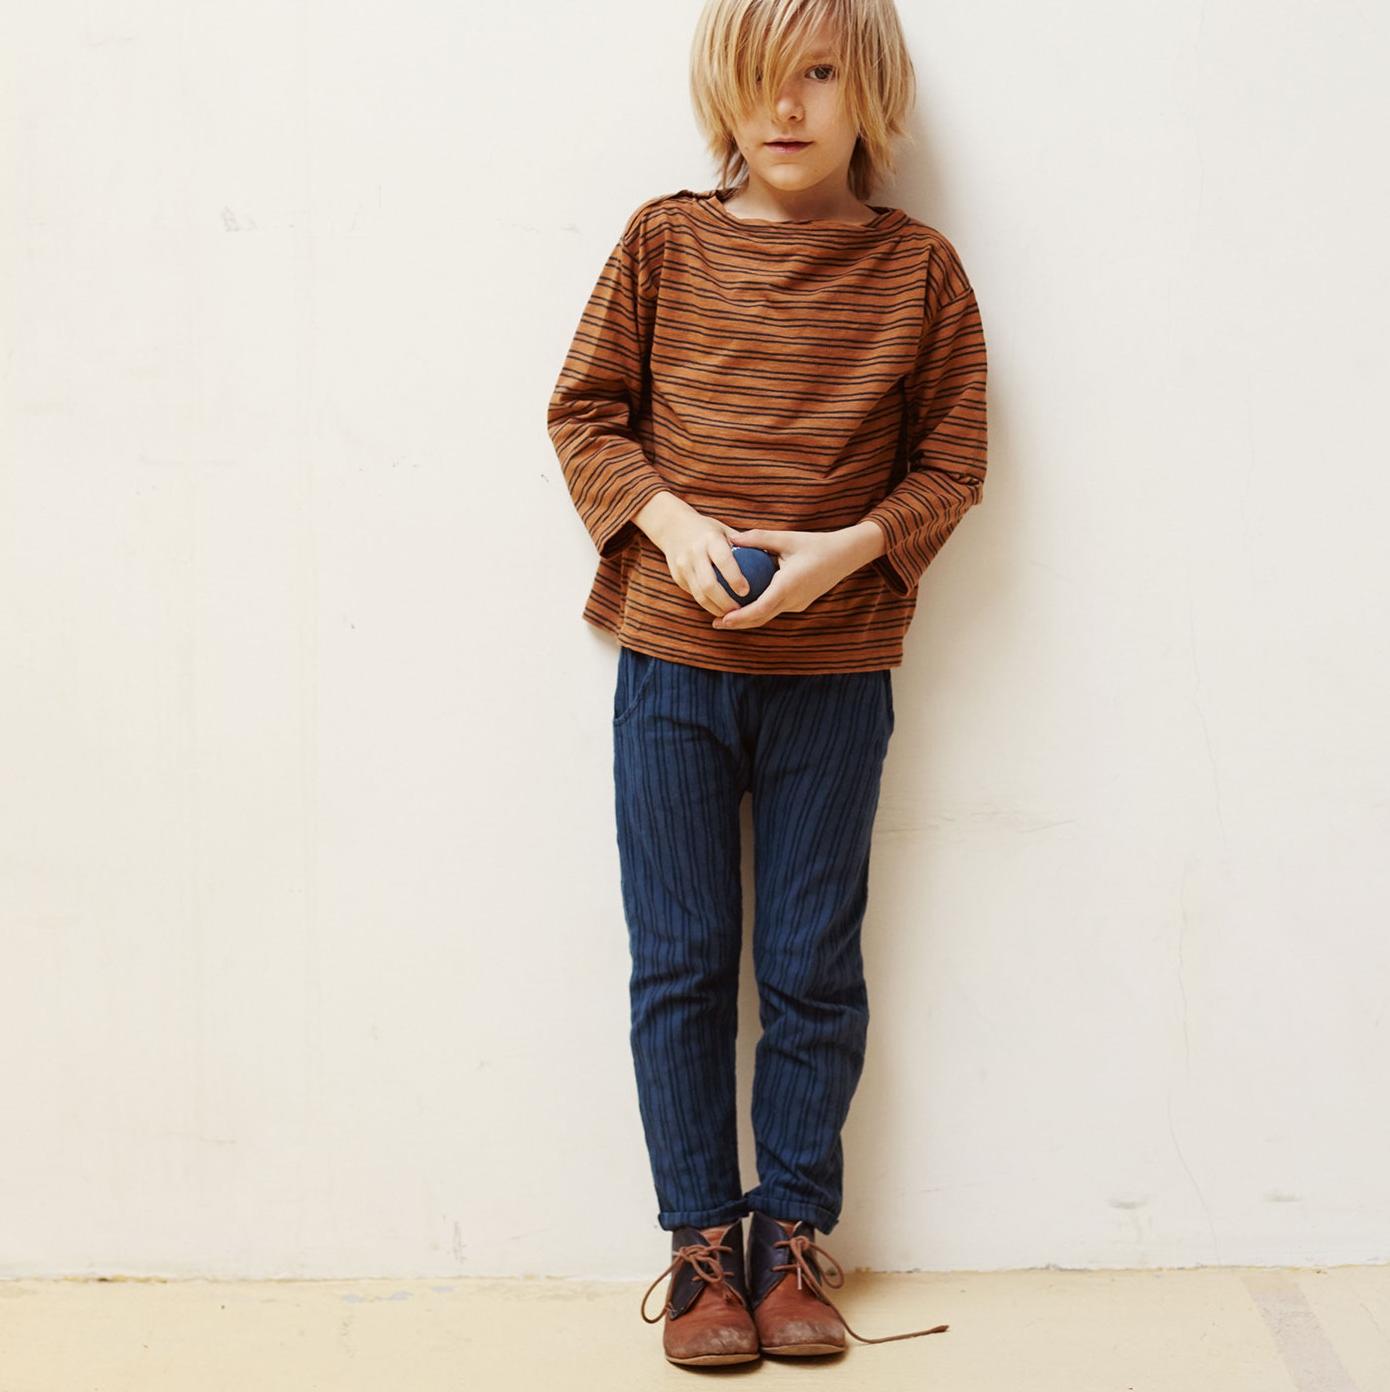 pantalon-chino-striped.jpg